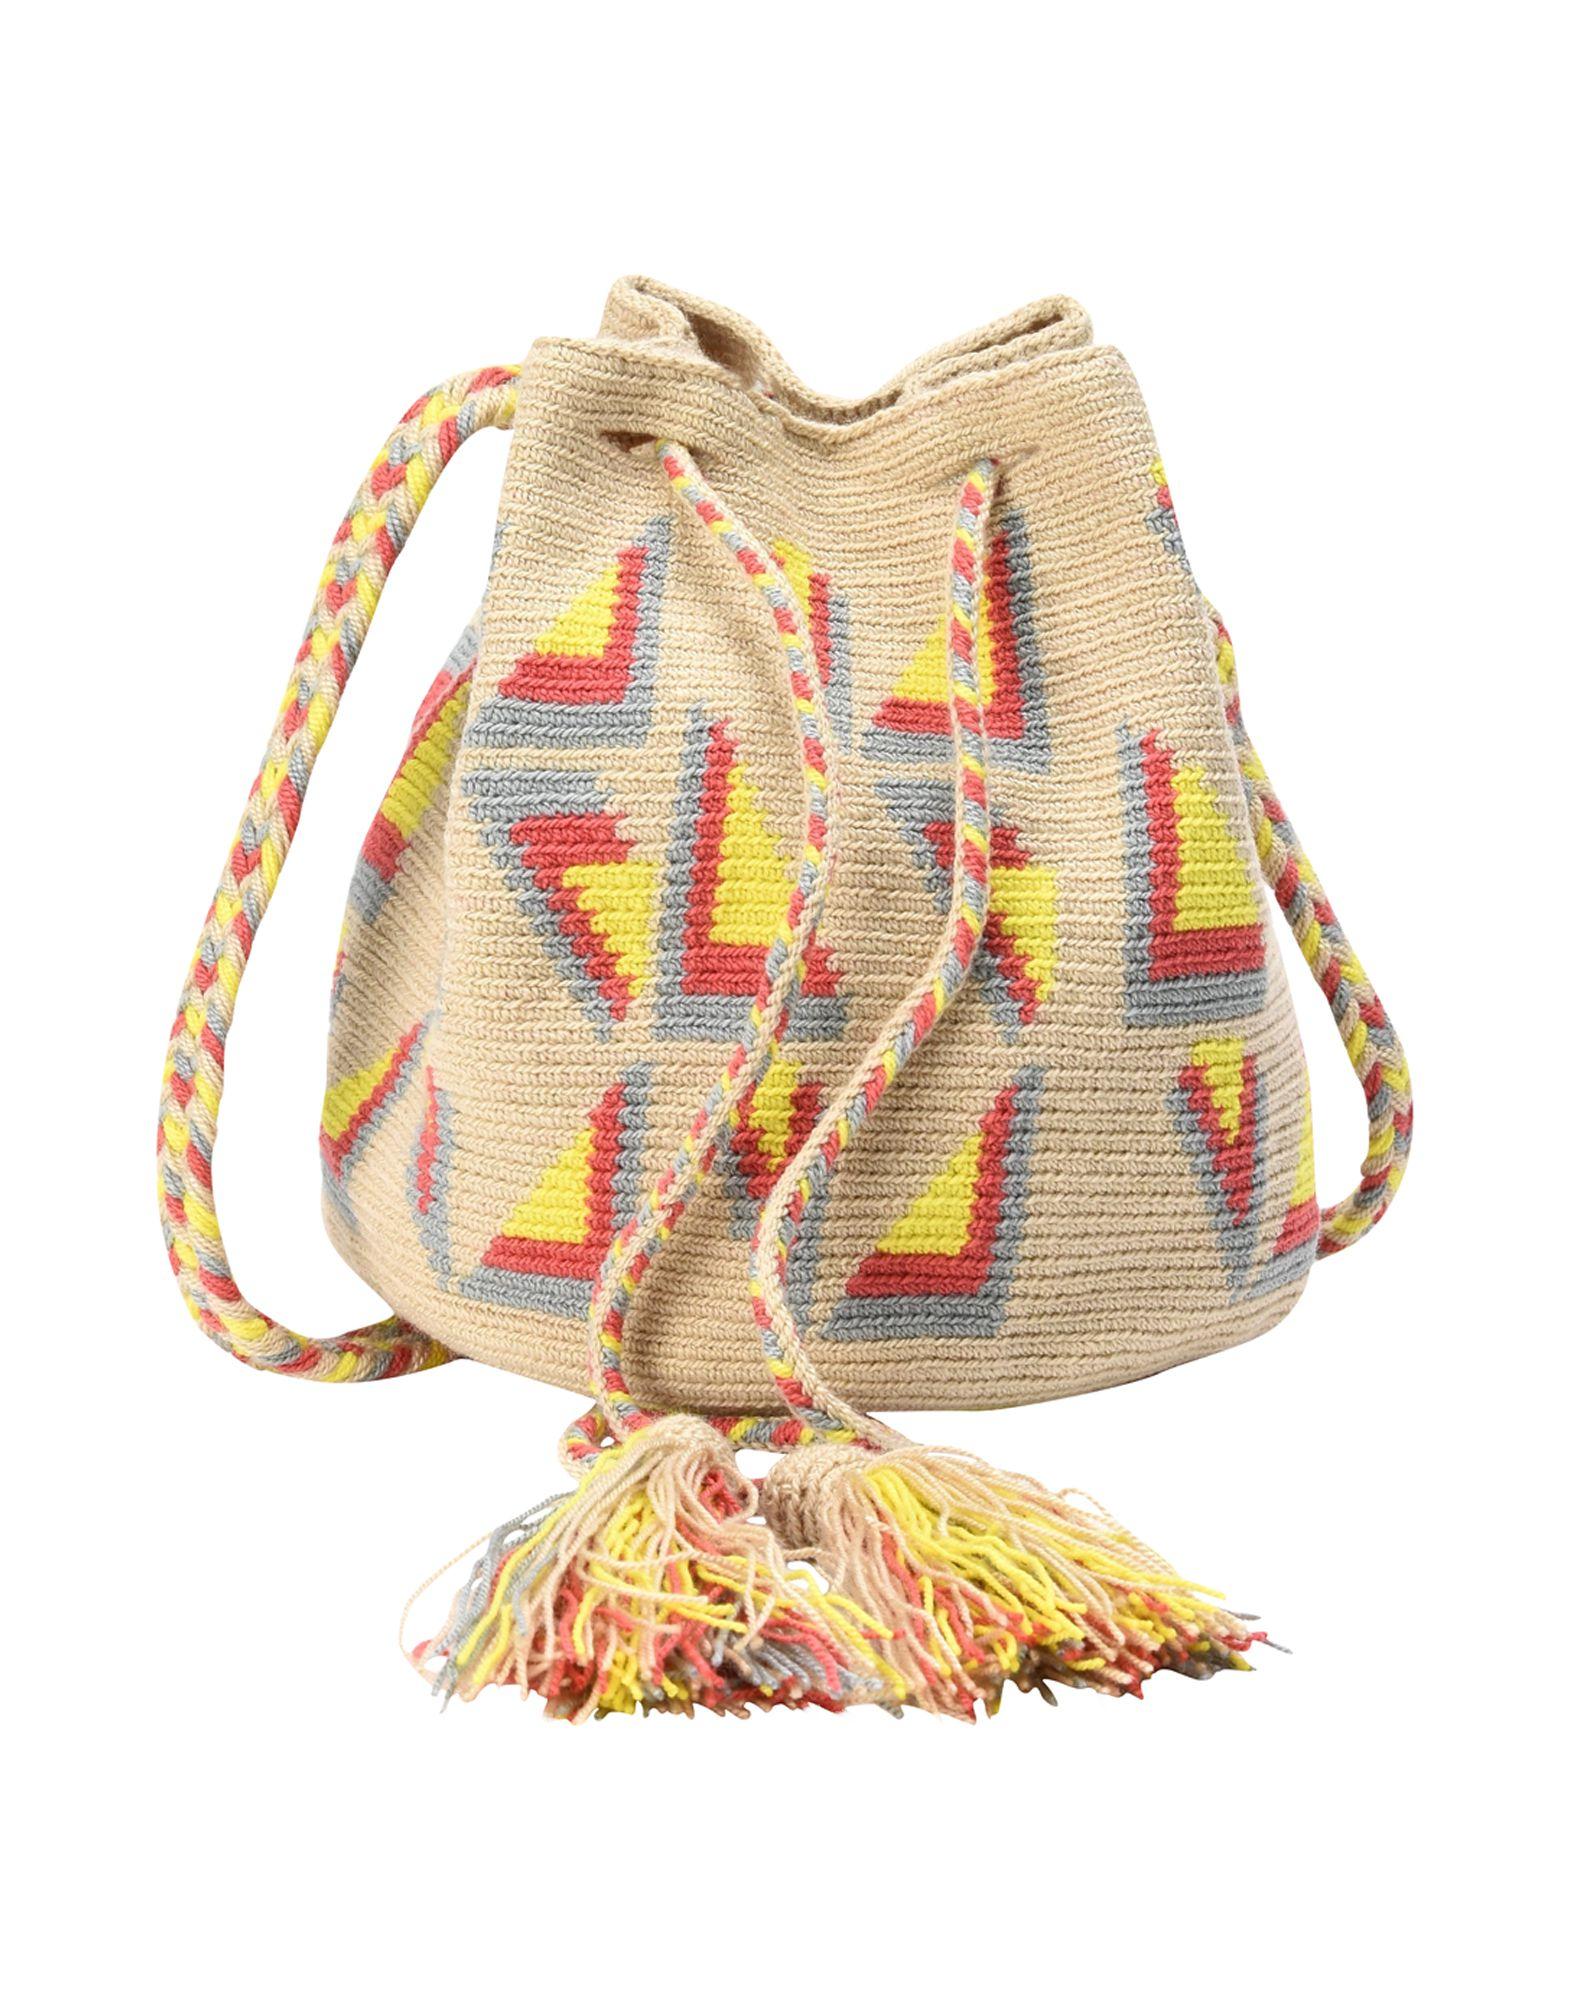 Borsa A Tracolla Guanabana Medium Wayuu Bag - Donna - Acquista online su